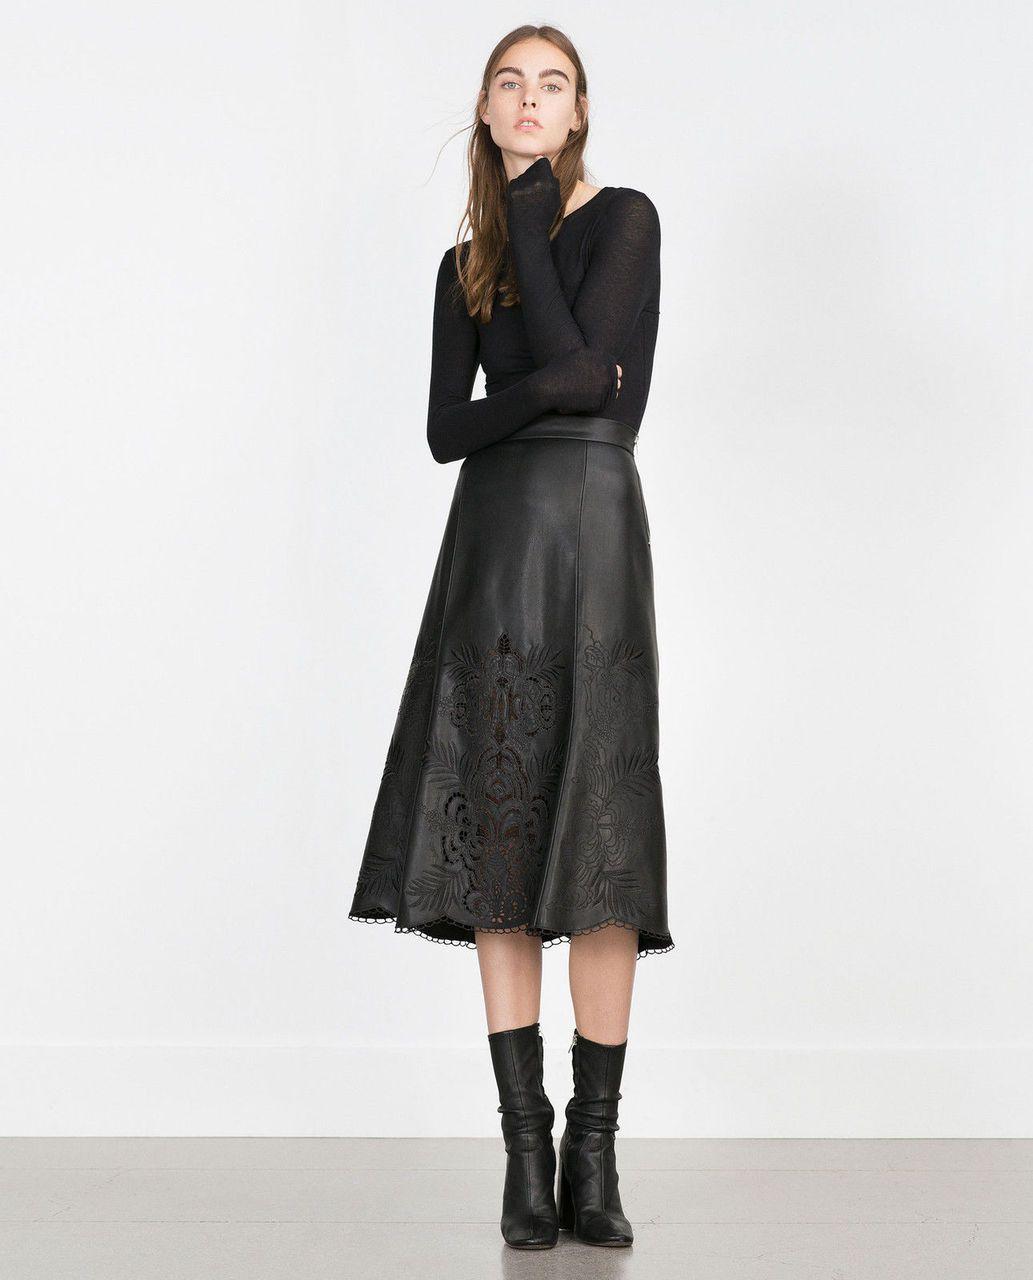 e6e58f34db Zara Black Faux Leather Embroidered Midi Skirt - Beautiful Wardrobe ...